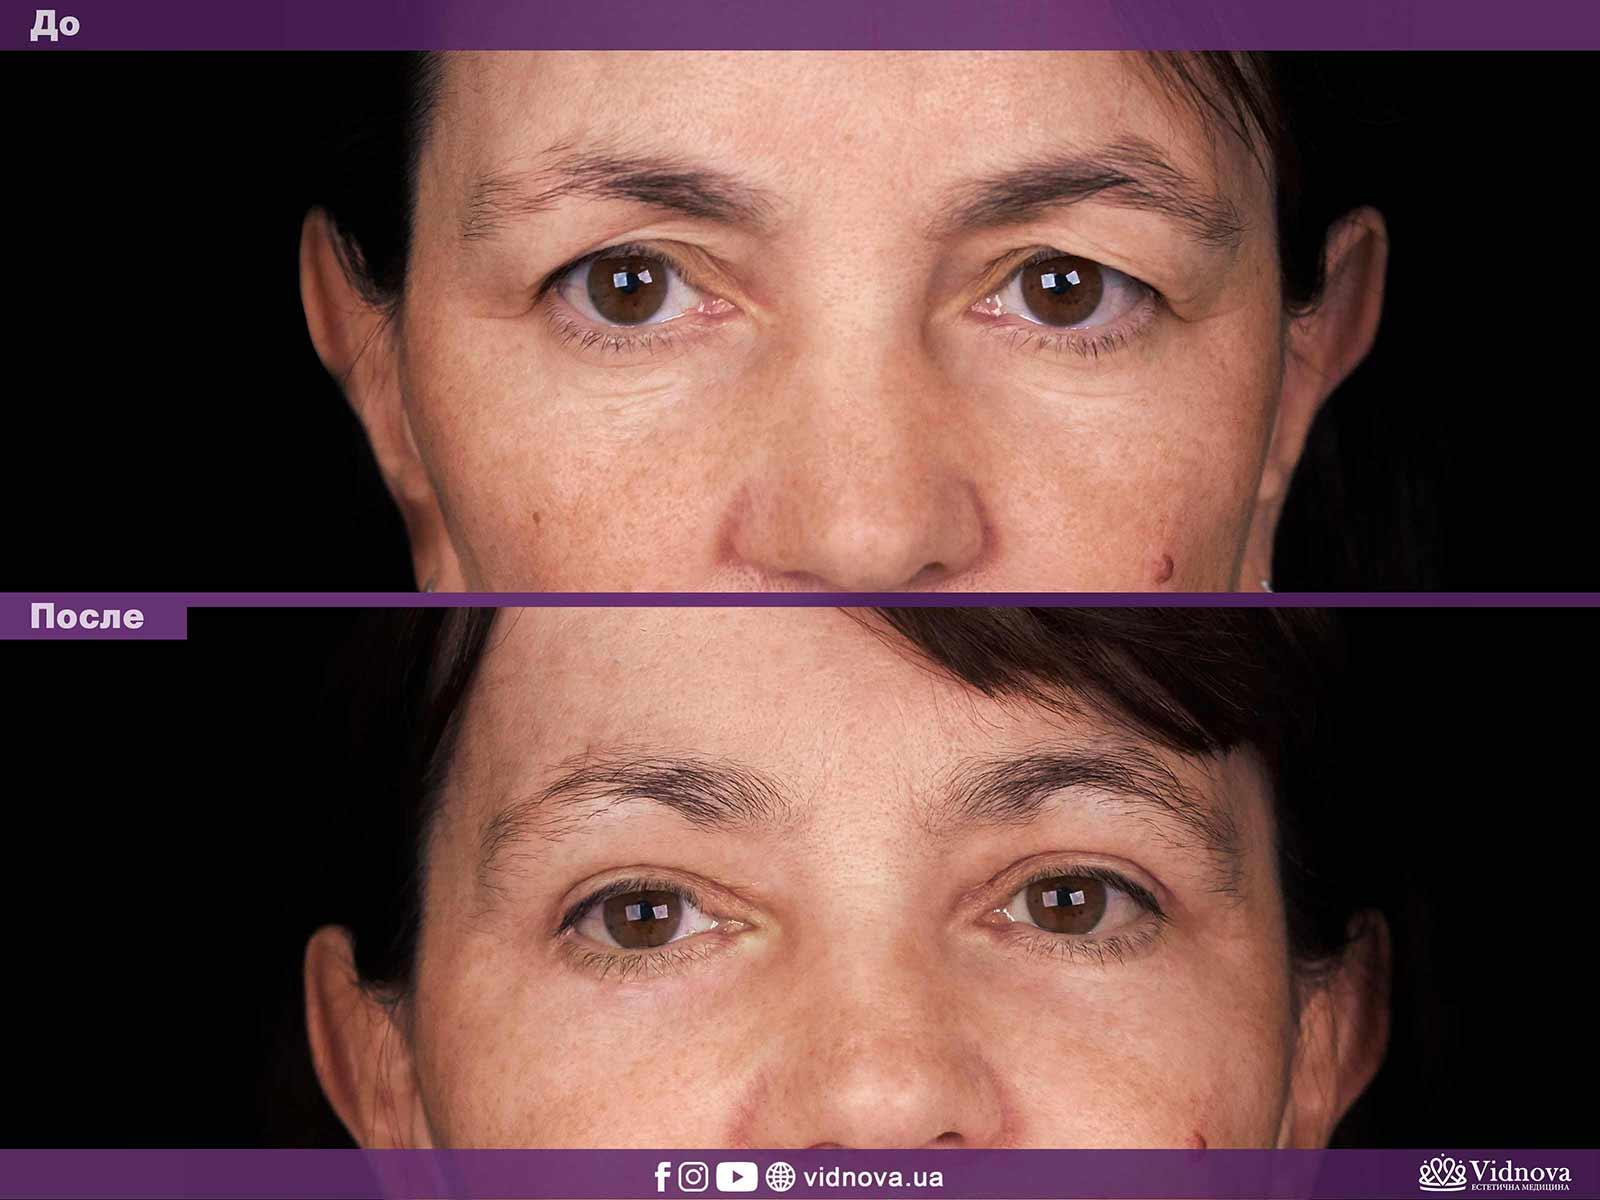 Блефаропластика: Фото До и После - Пример №9-1 - Клиника Vidnova